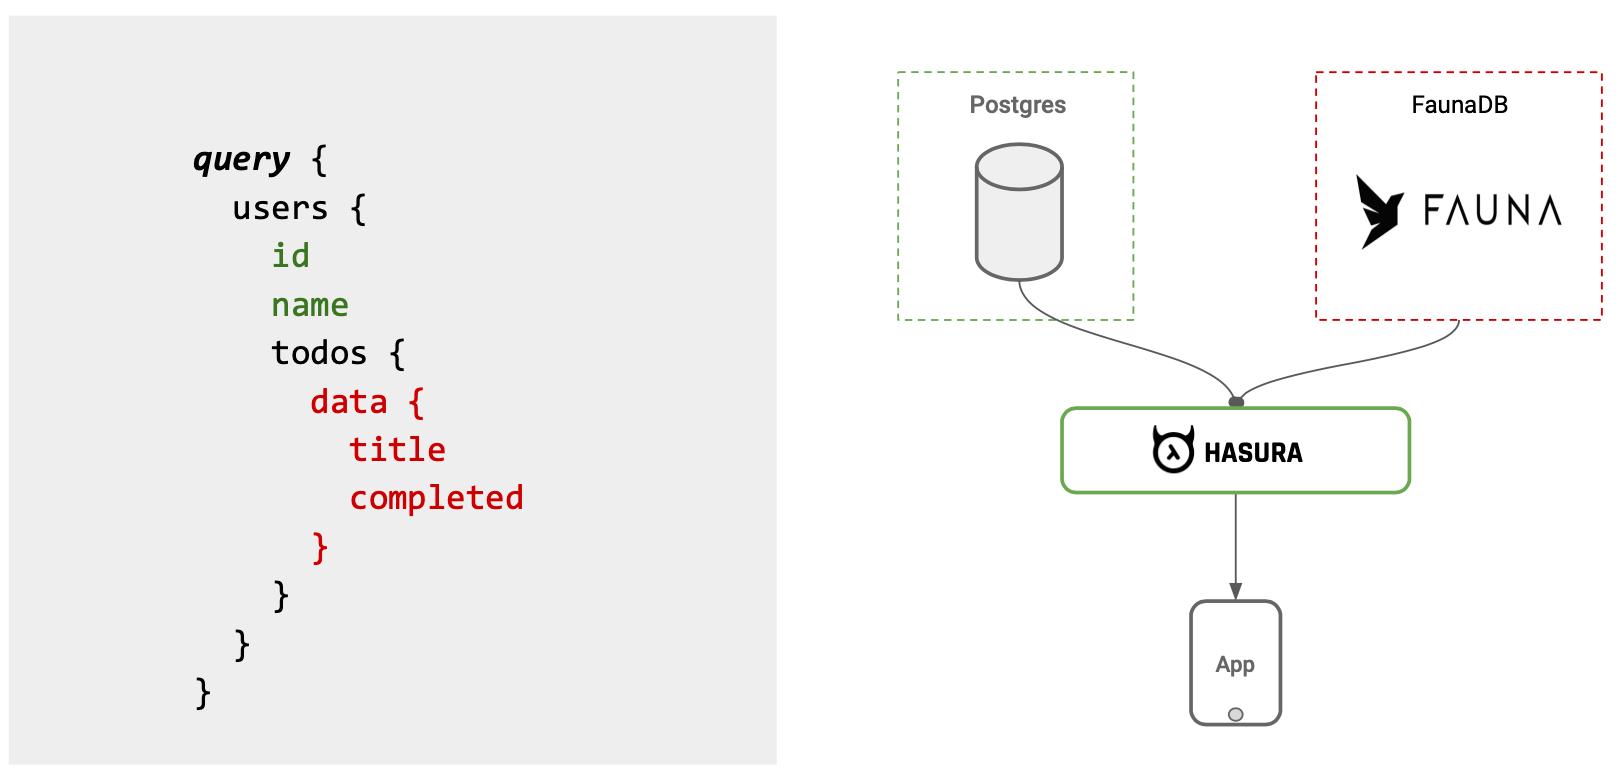 Joining Postgres Data with FaunaDB Serverless using Hasura Remote Joins